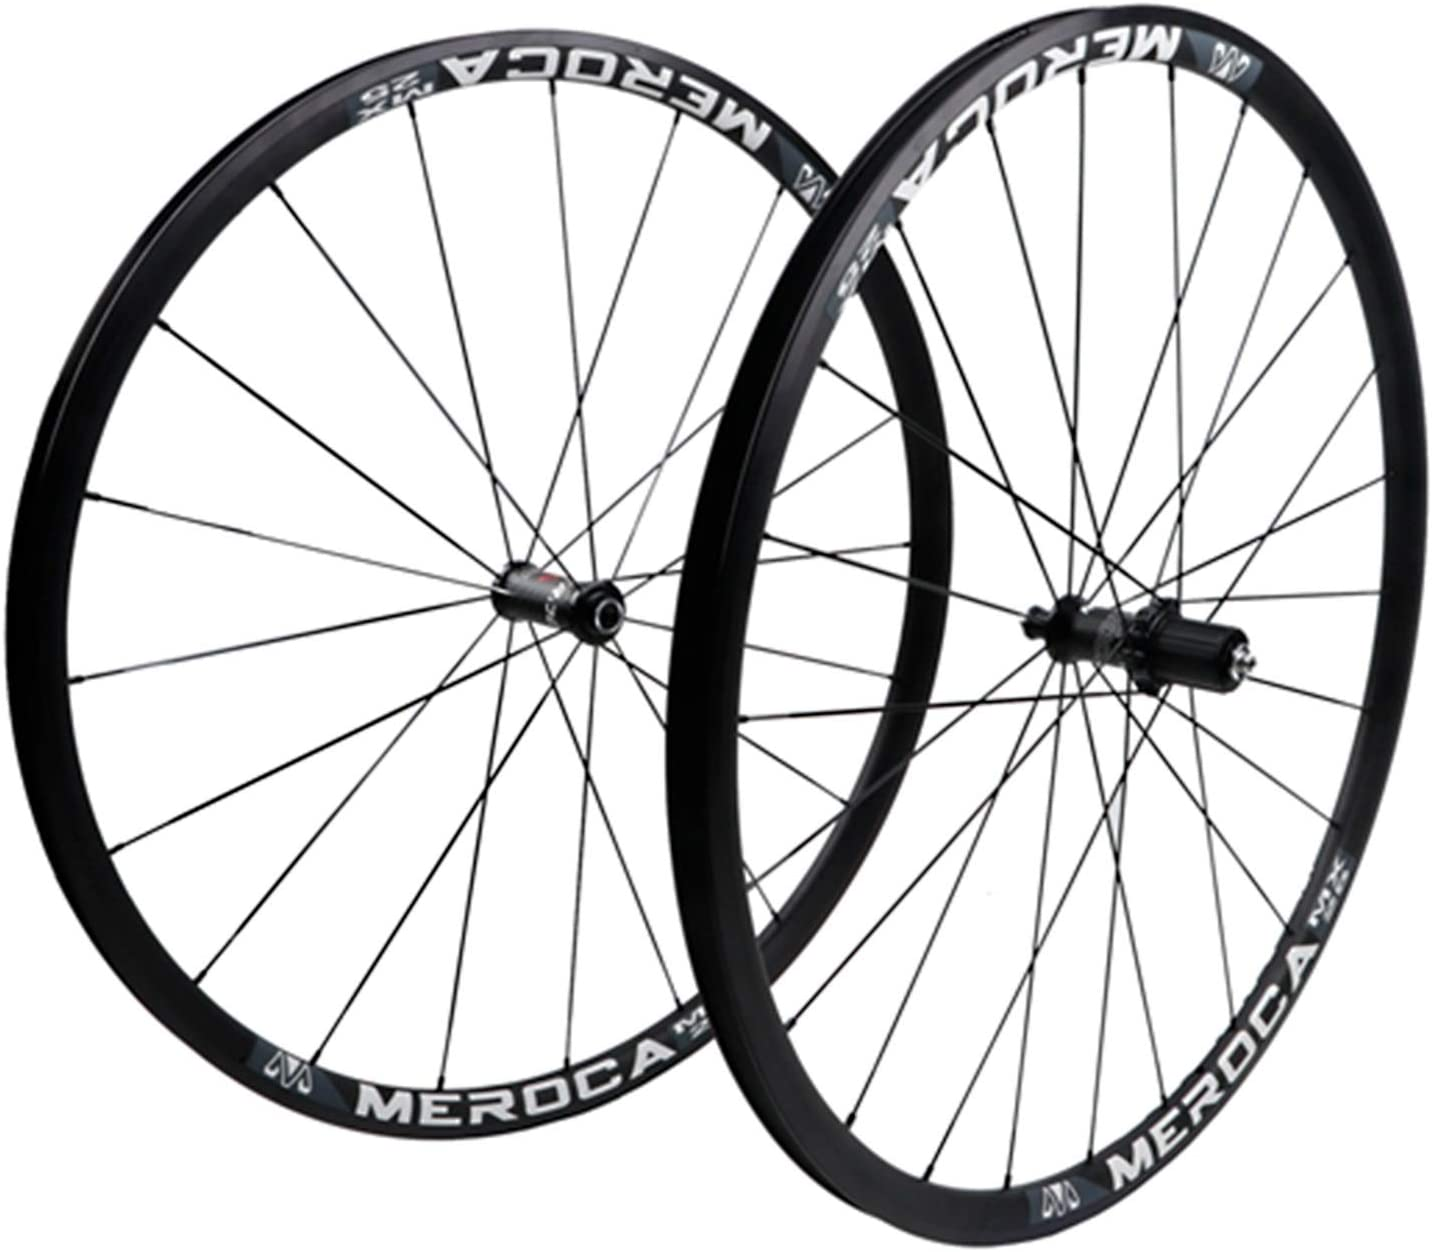 ZNND Road Bike Wheelset 700c Double V Alloy C Aluminum Brak depot Special sale item Wall